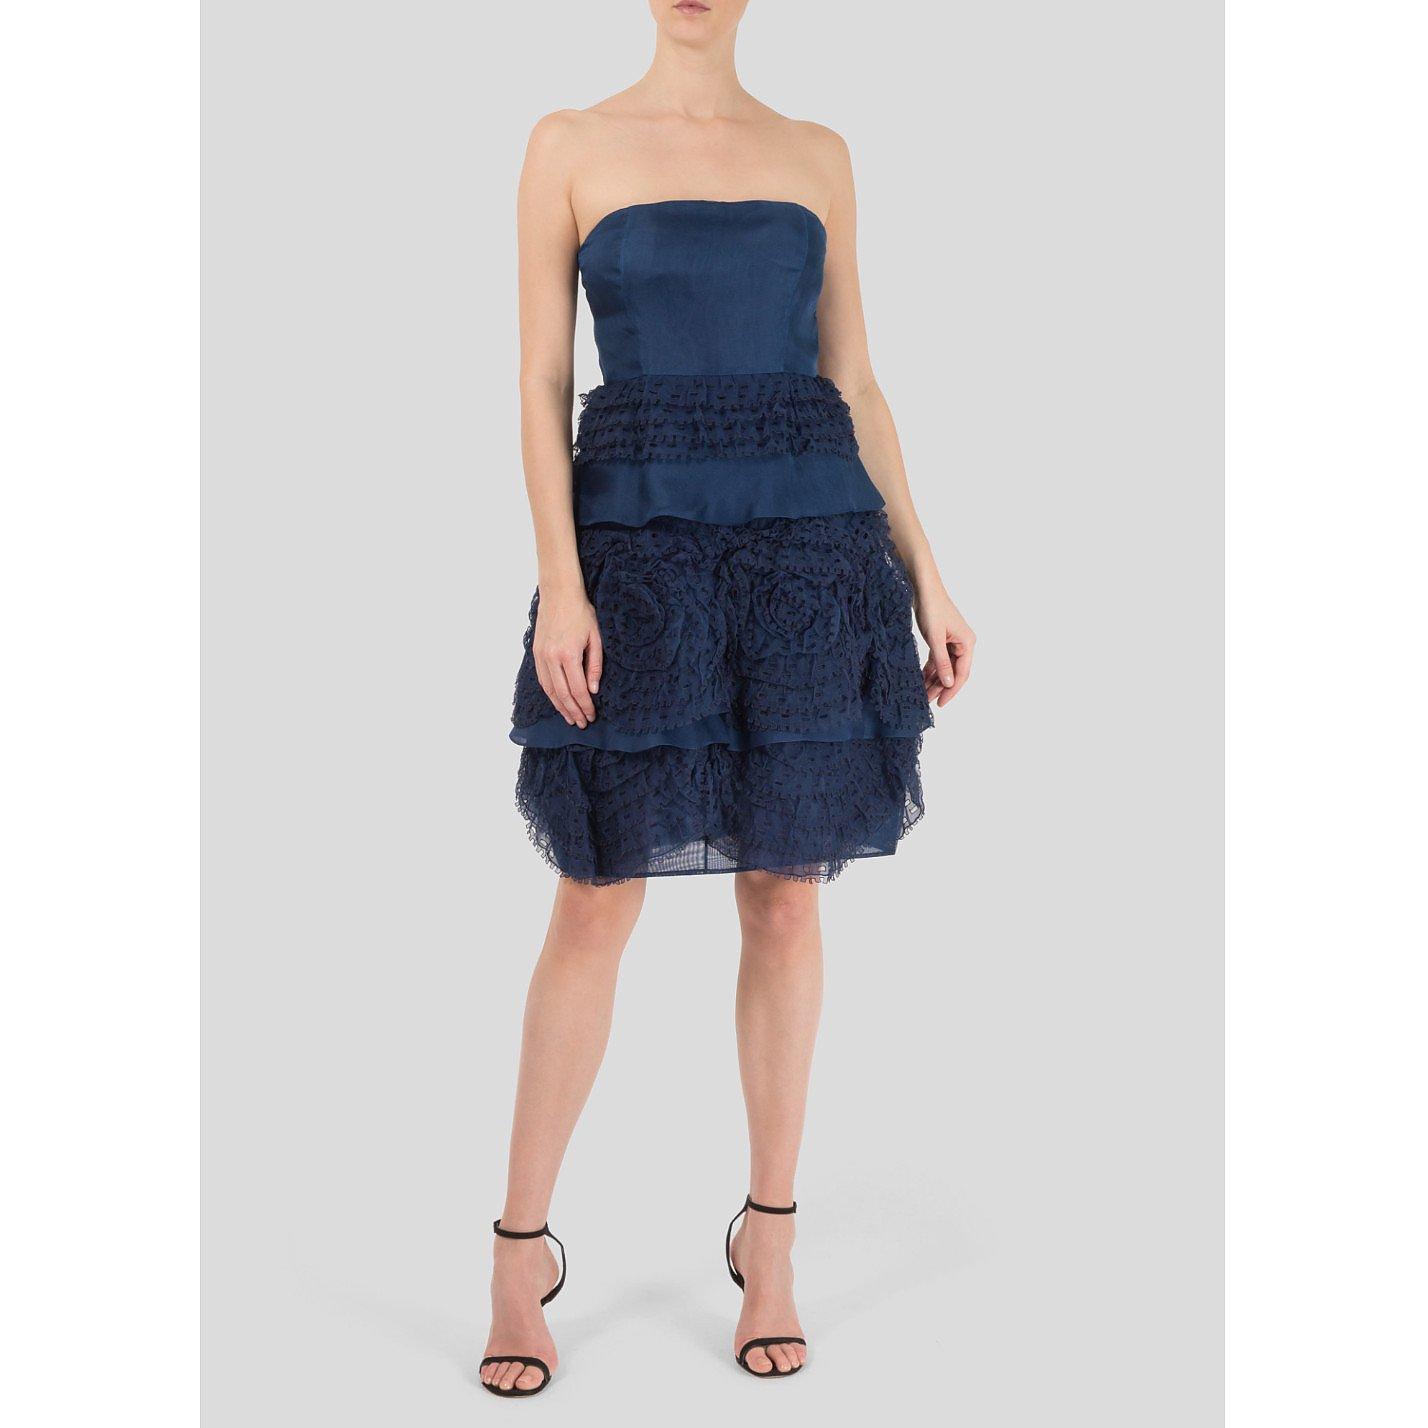 Valentino Sleeveless Tiered Ruffle Dress